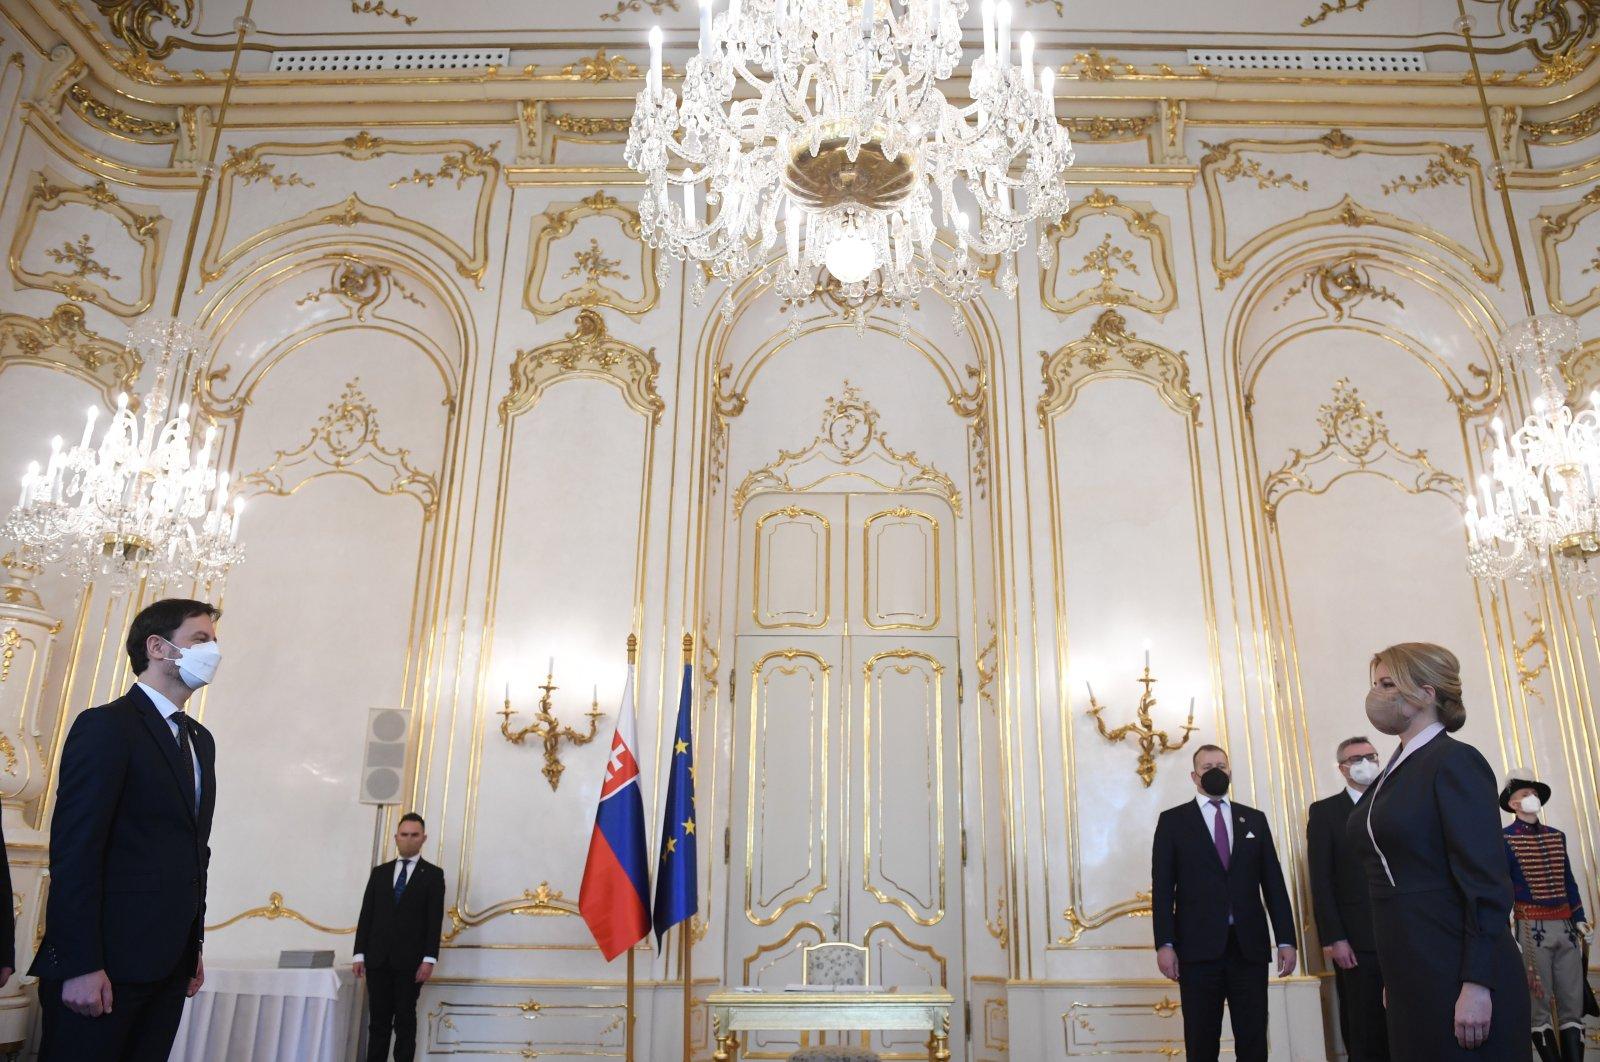 Slovak President Zuzana Caputova (R), appoints members of the new government to be headed by Prime Minister Eduard Heger (L), in Bratislava, Slovakia, April 1, 2021. (AP)